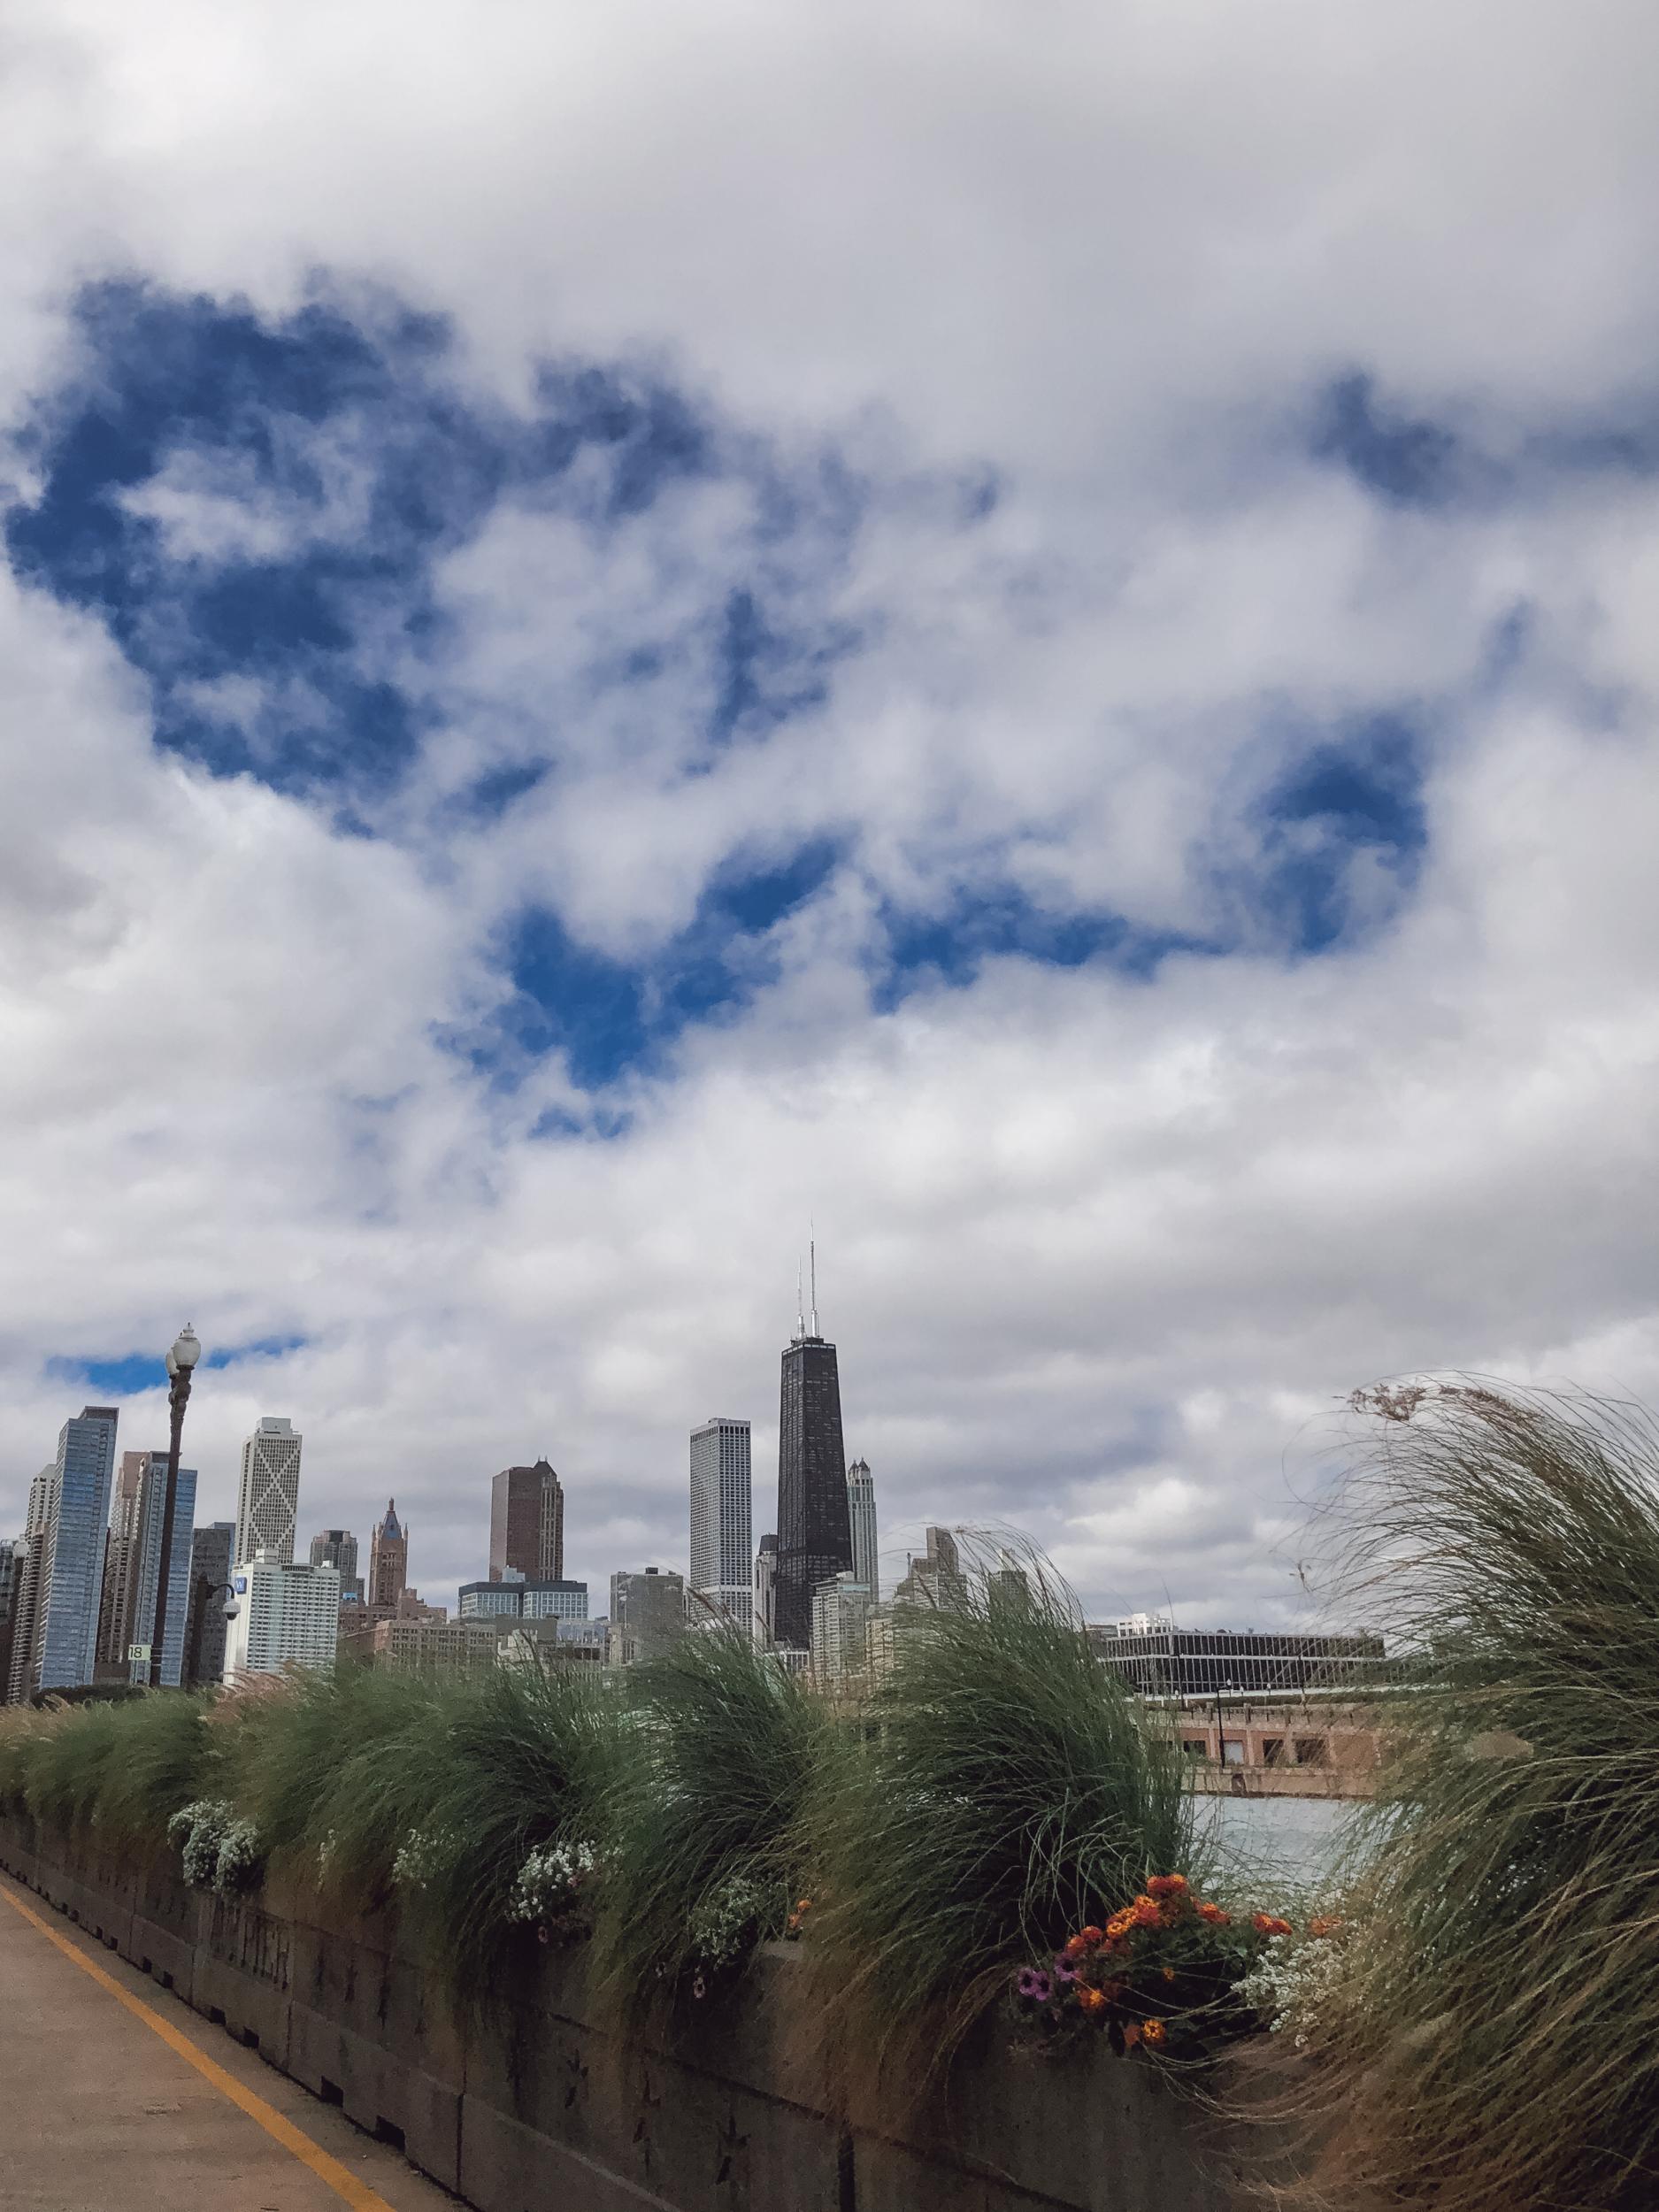 Chicago Illinois Travel Guide, Chicago, Chicago Illinois, Chicago Board Walk, Chicago Skyline, Rachel Roams, Windy City-www.rachelsmak.com1.jpg